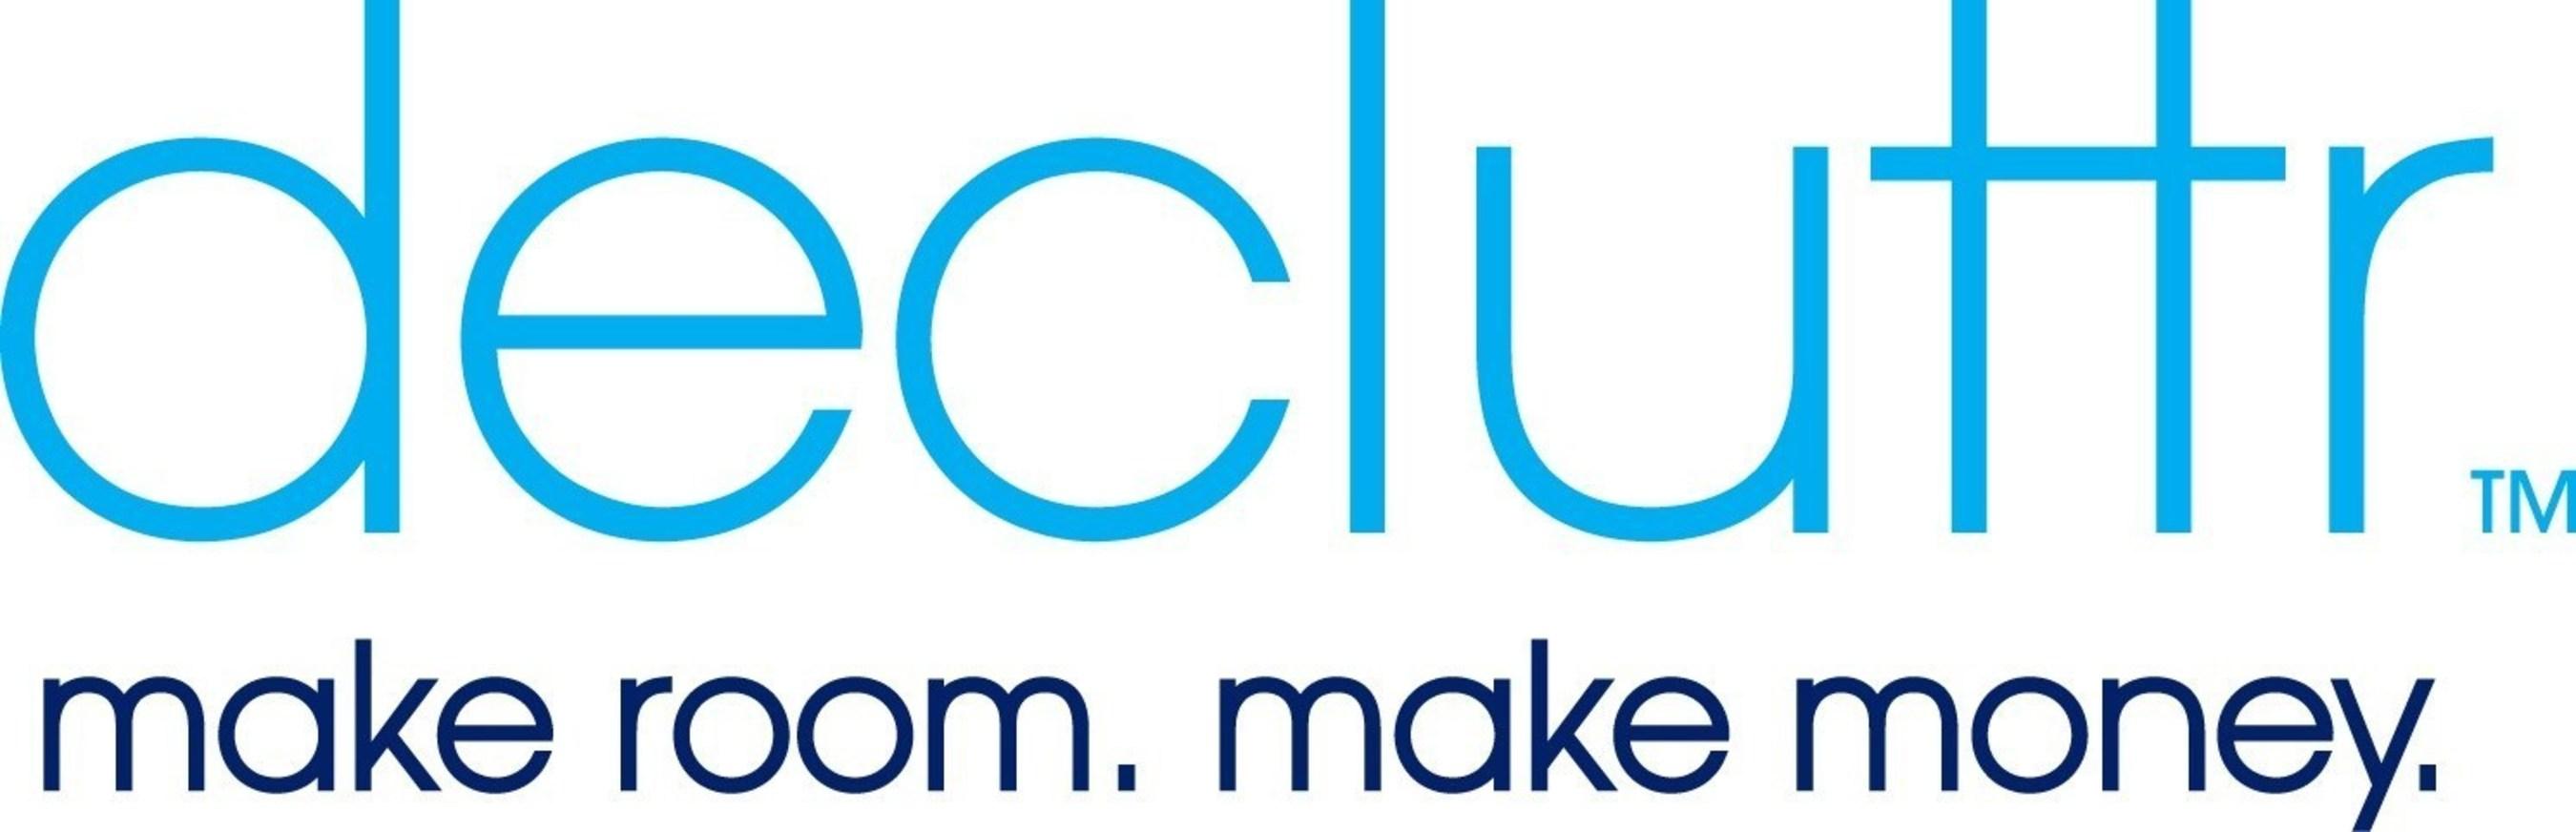 decluttr.com   make room. make money.